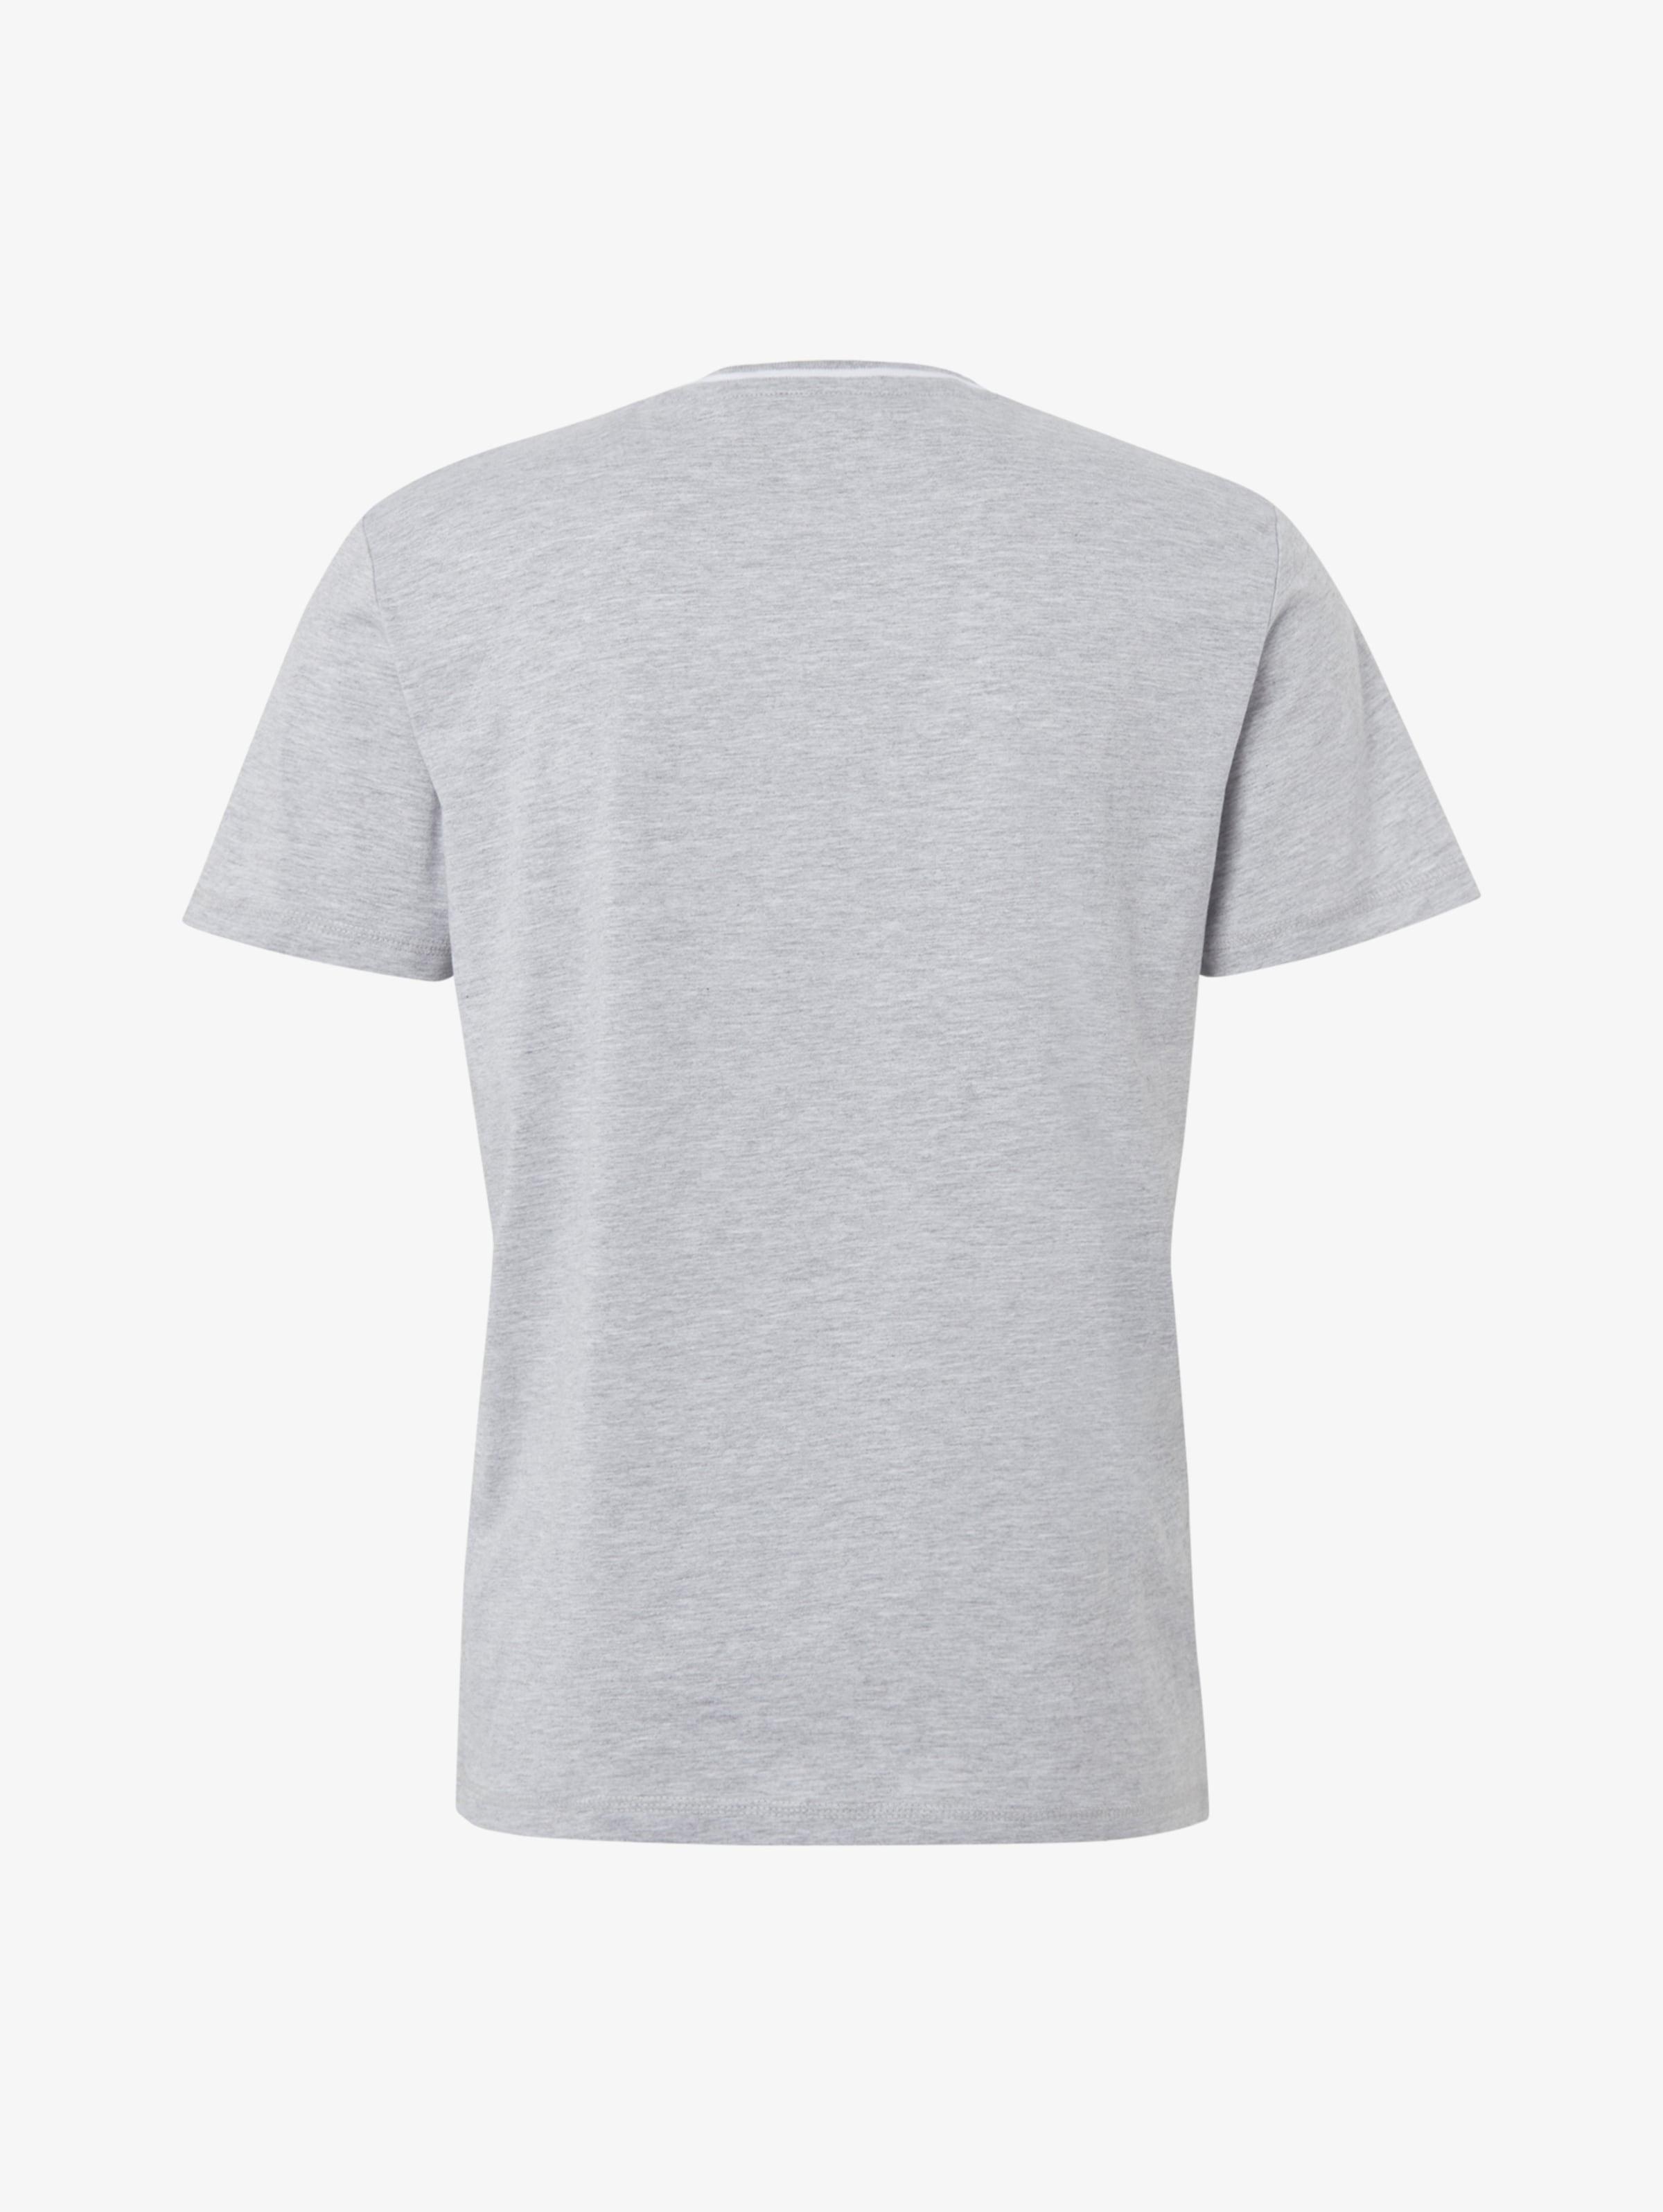 shirt Tailor NavyHellgrau In Tom T HID9YEW2